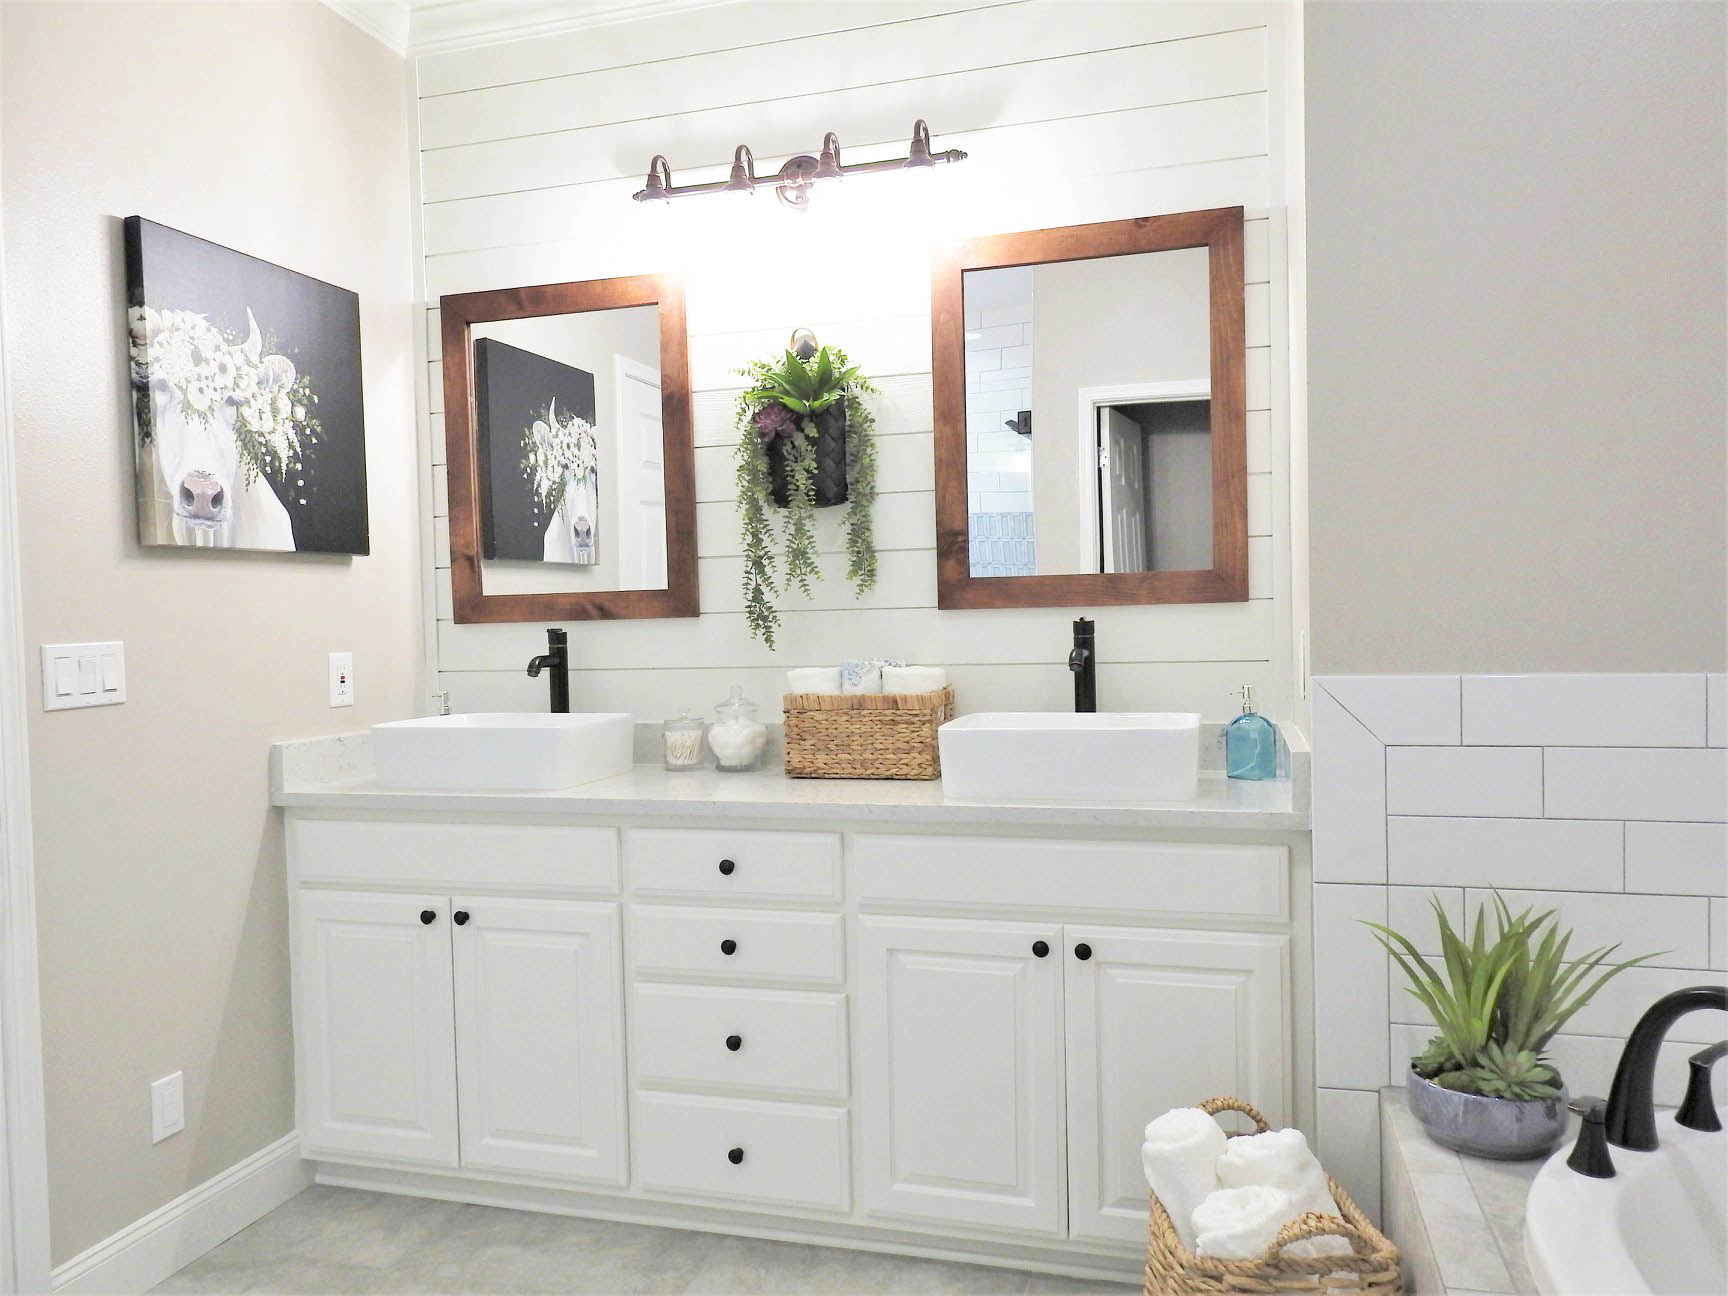 Benton Farmhouse Master Bathroom Remodel